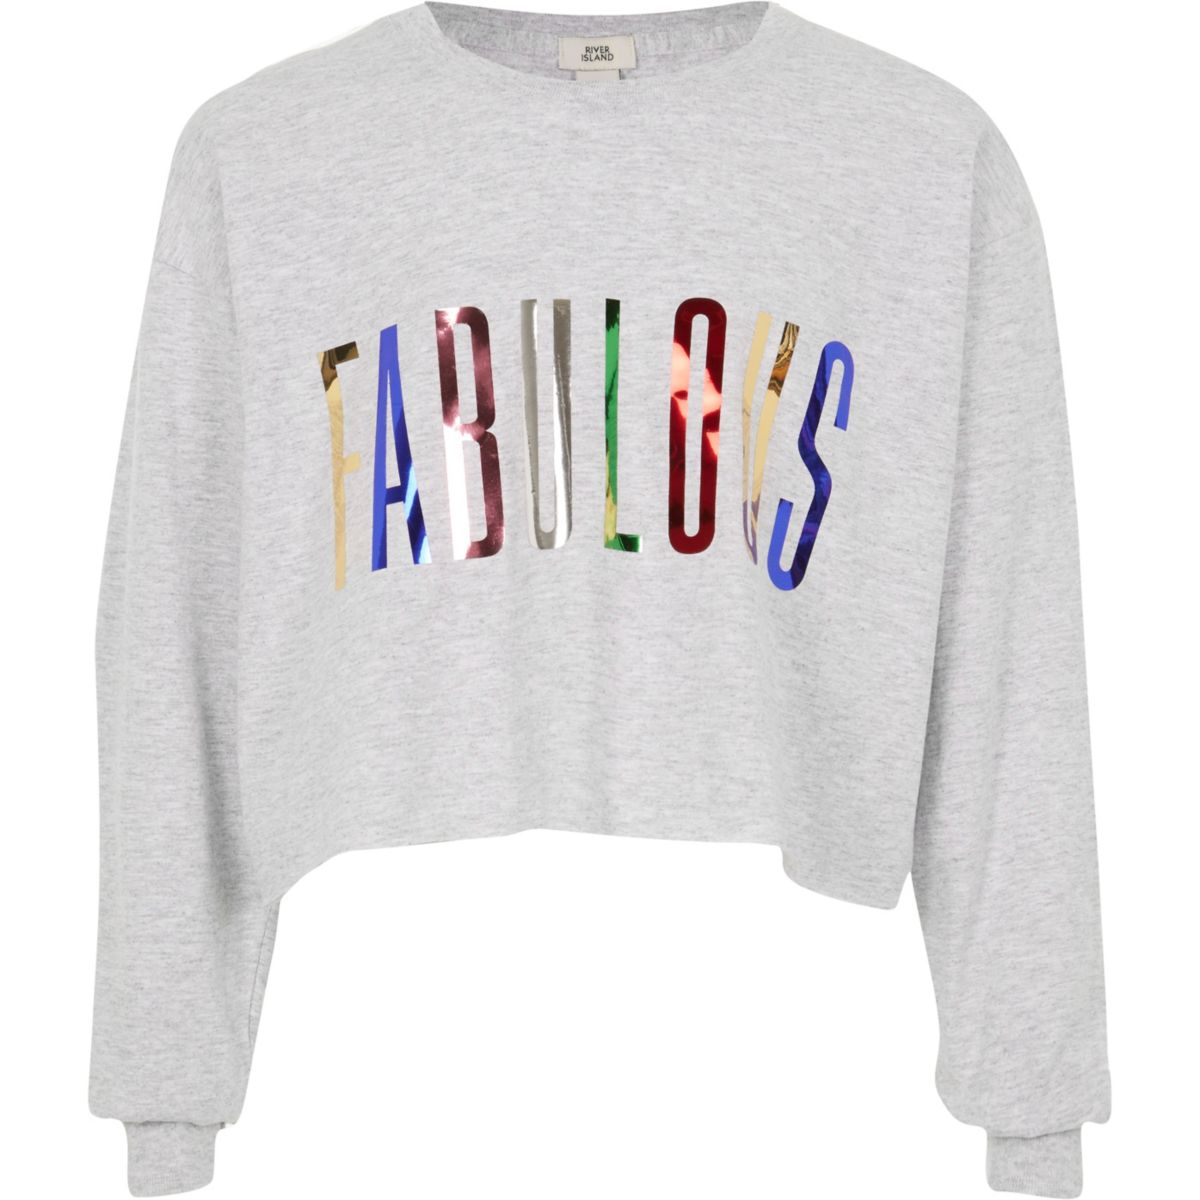 Girls grey 'fabulous' foil print T-shirt